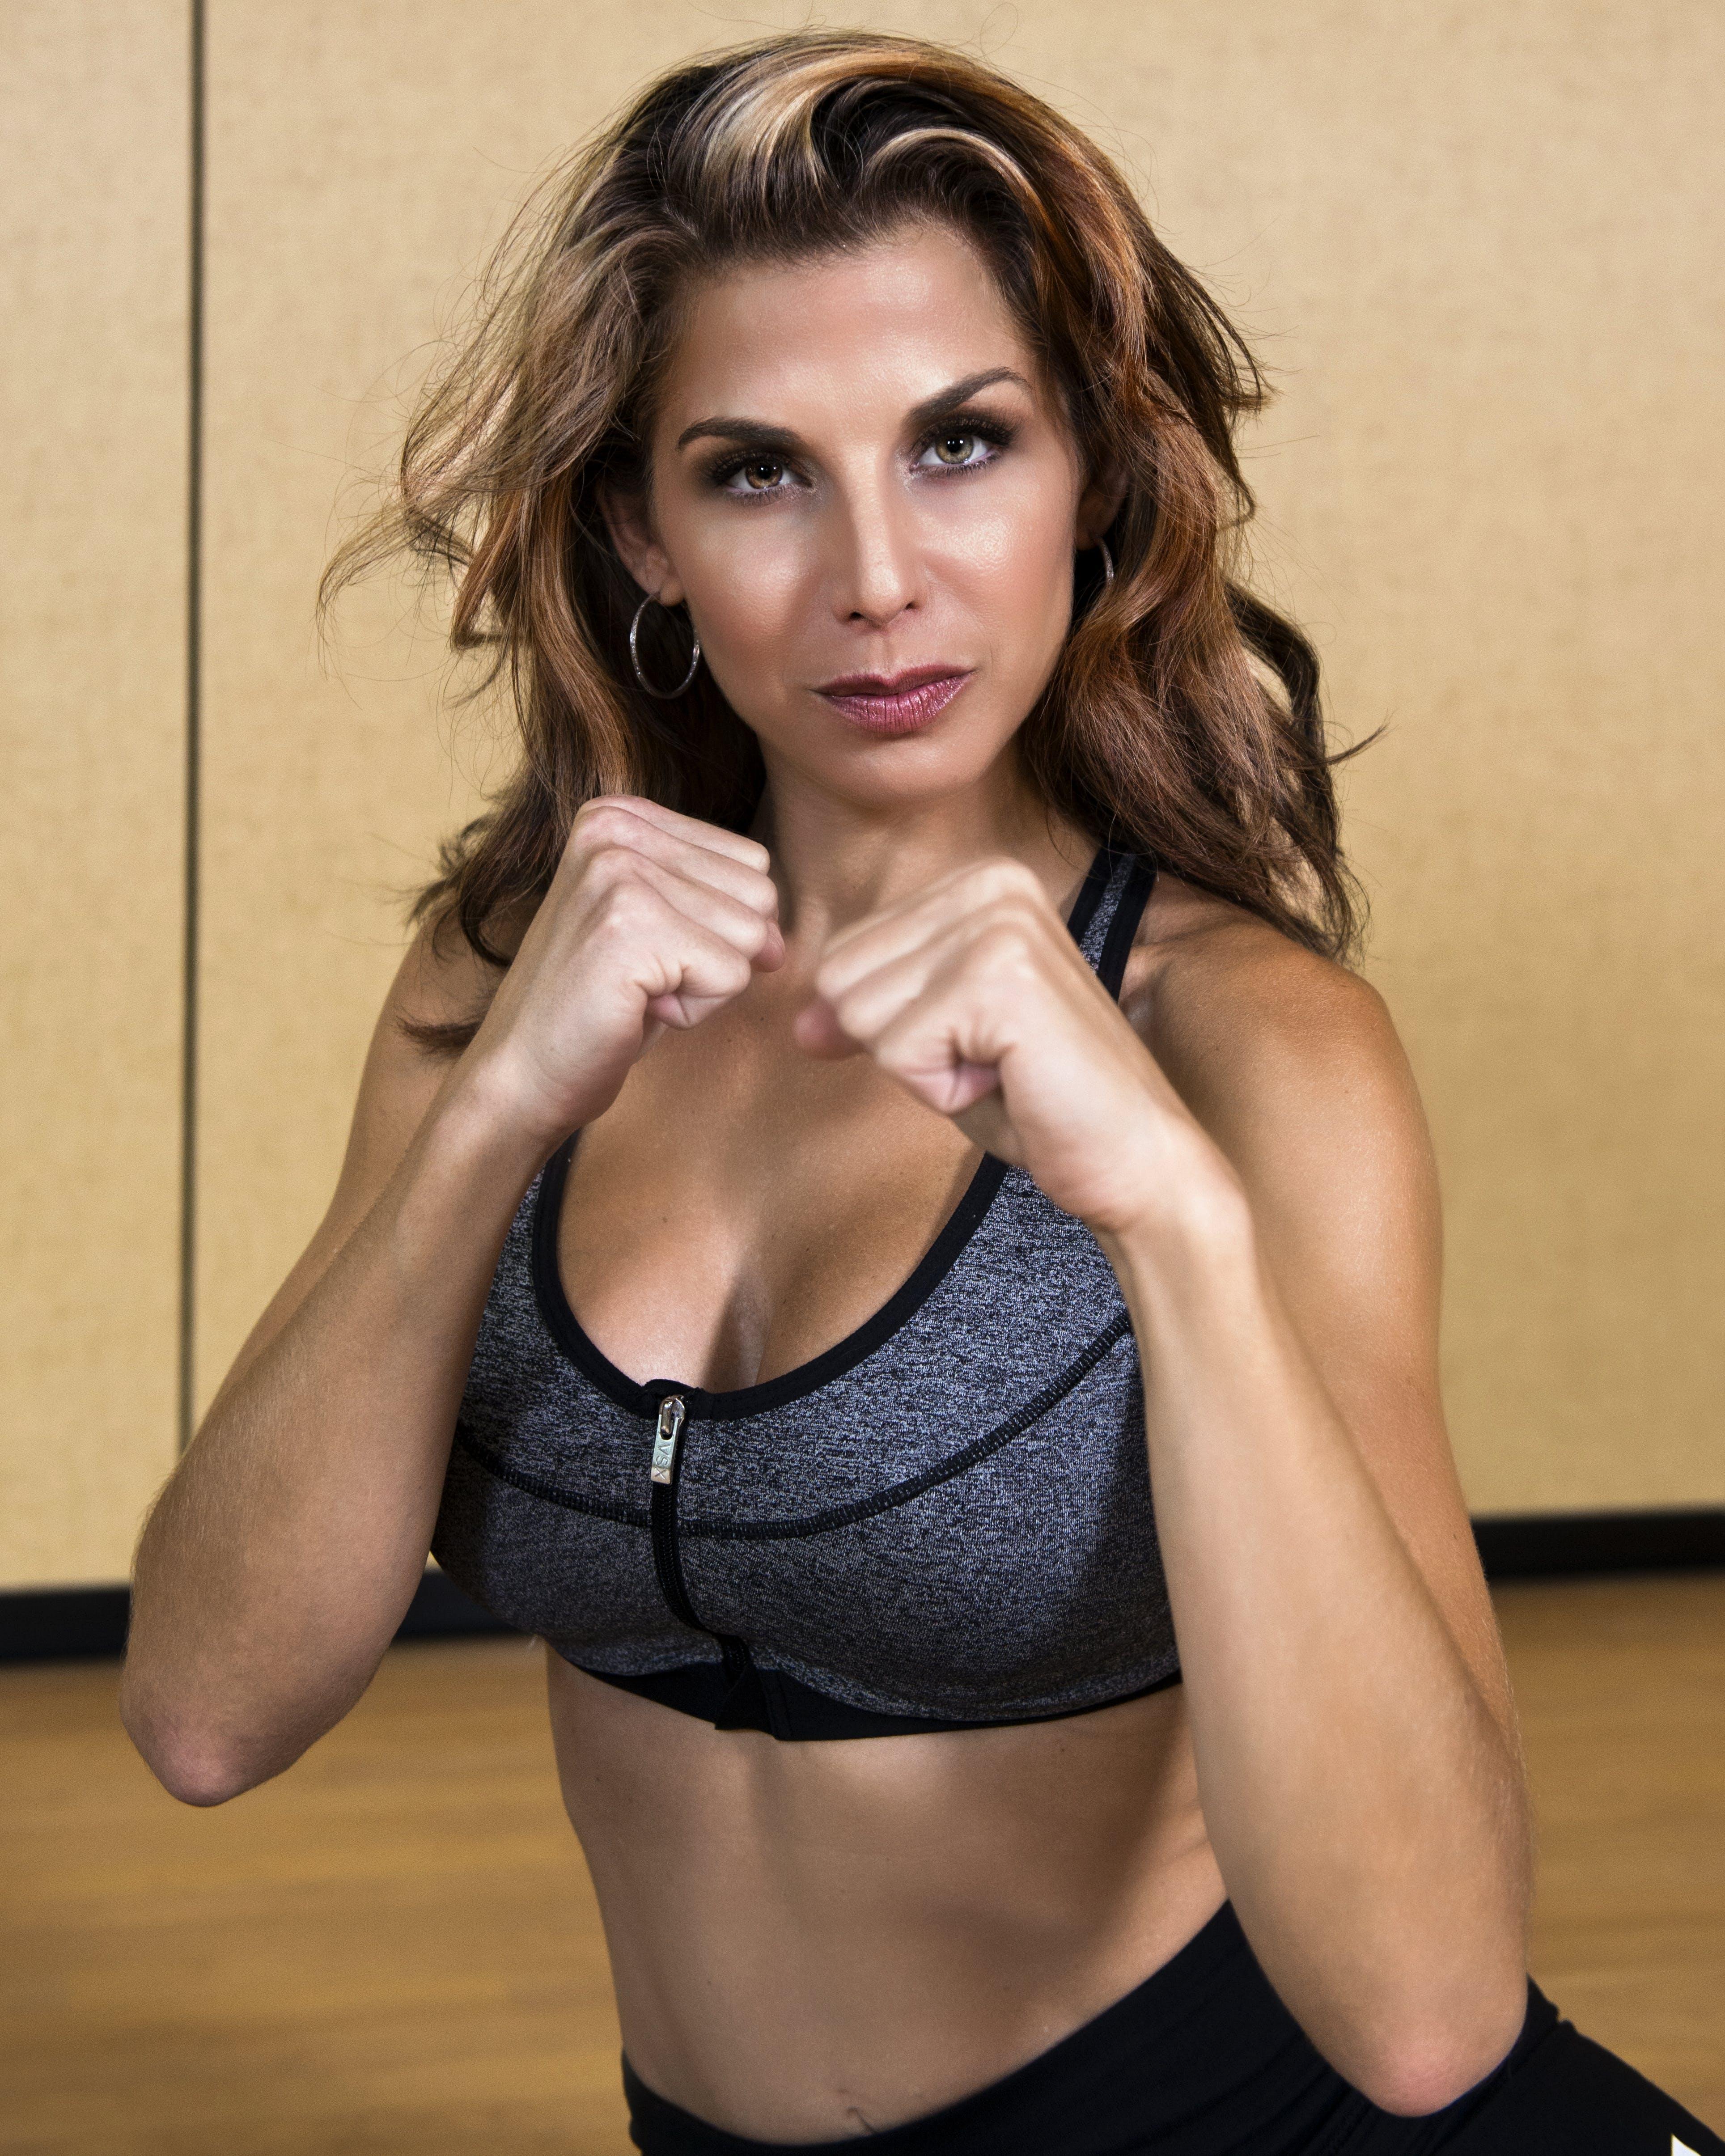 Woman Wearing Gray and Black Sports Bra